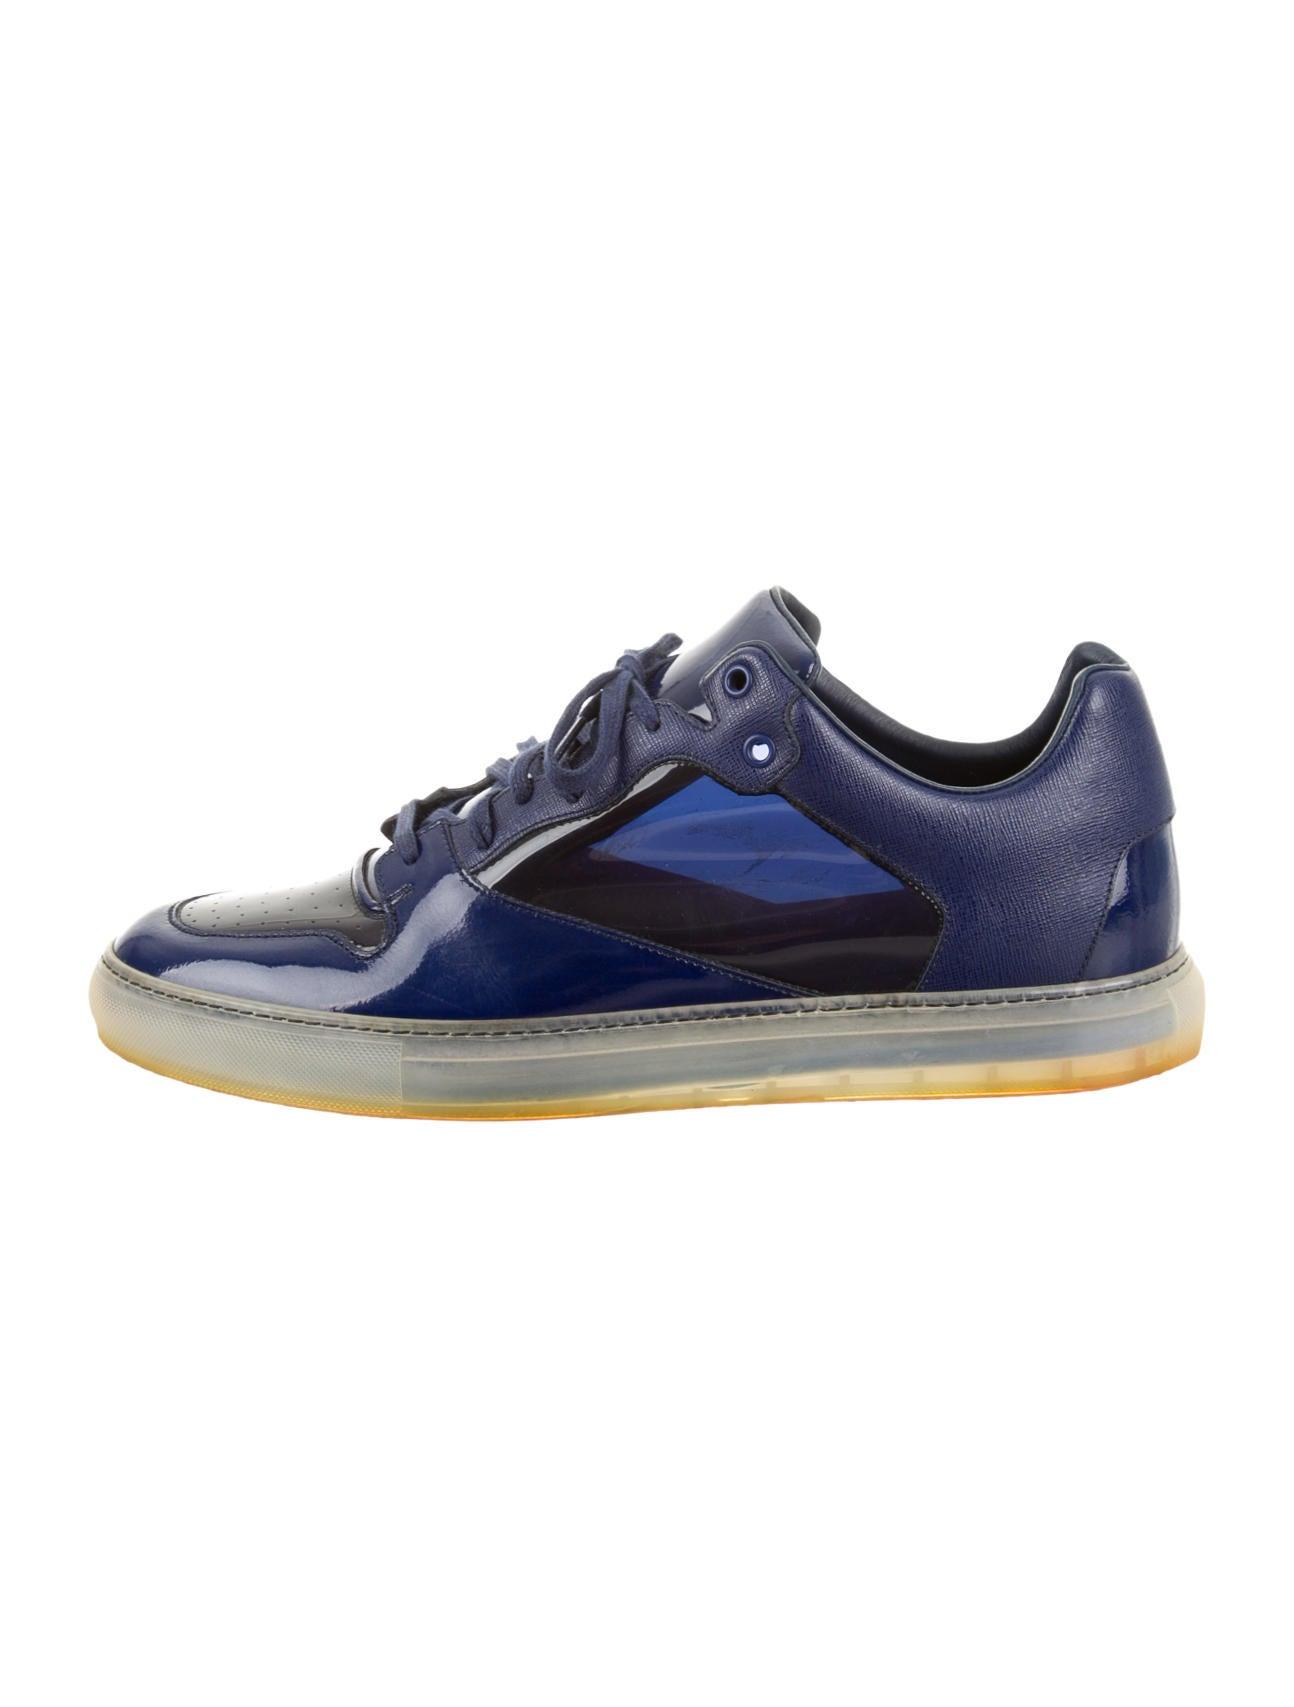 balenciaga sneakers mens shoes bal30684 the realreal. Black Bedroom Furniture Sets. Home Design Ideas